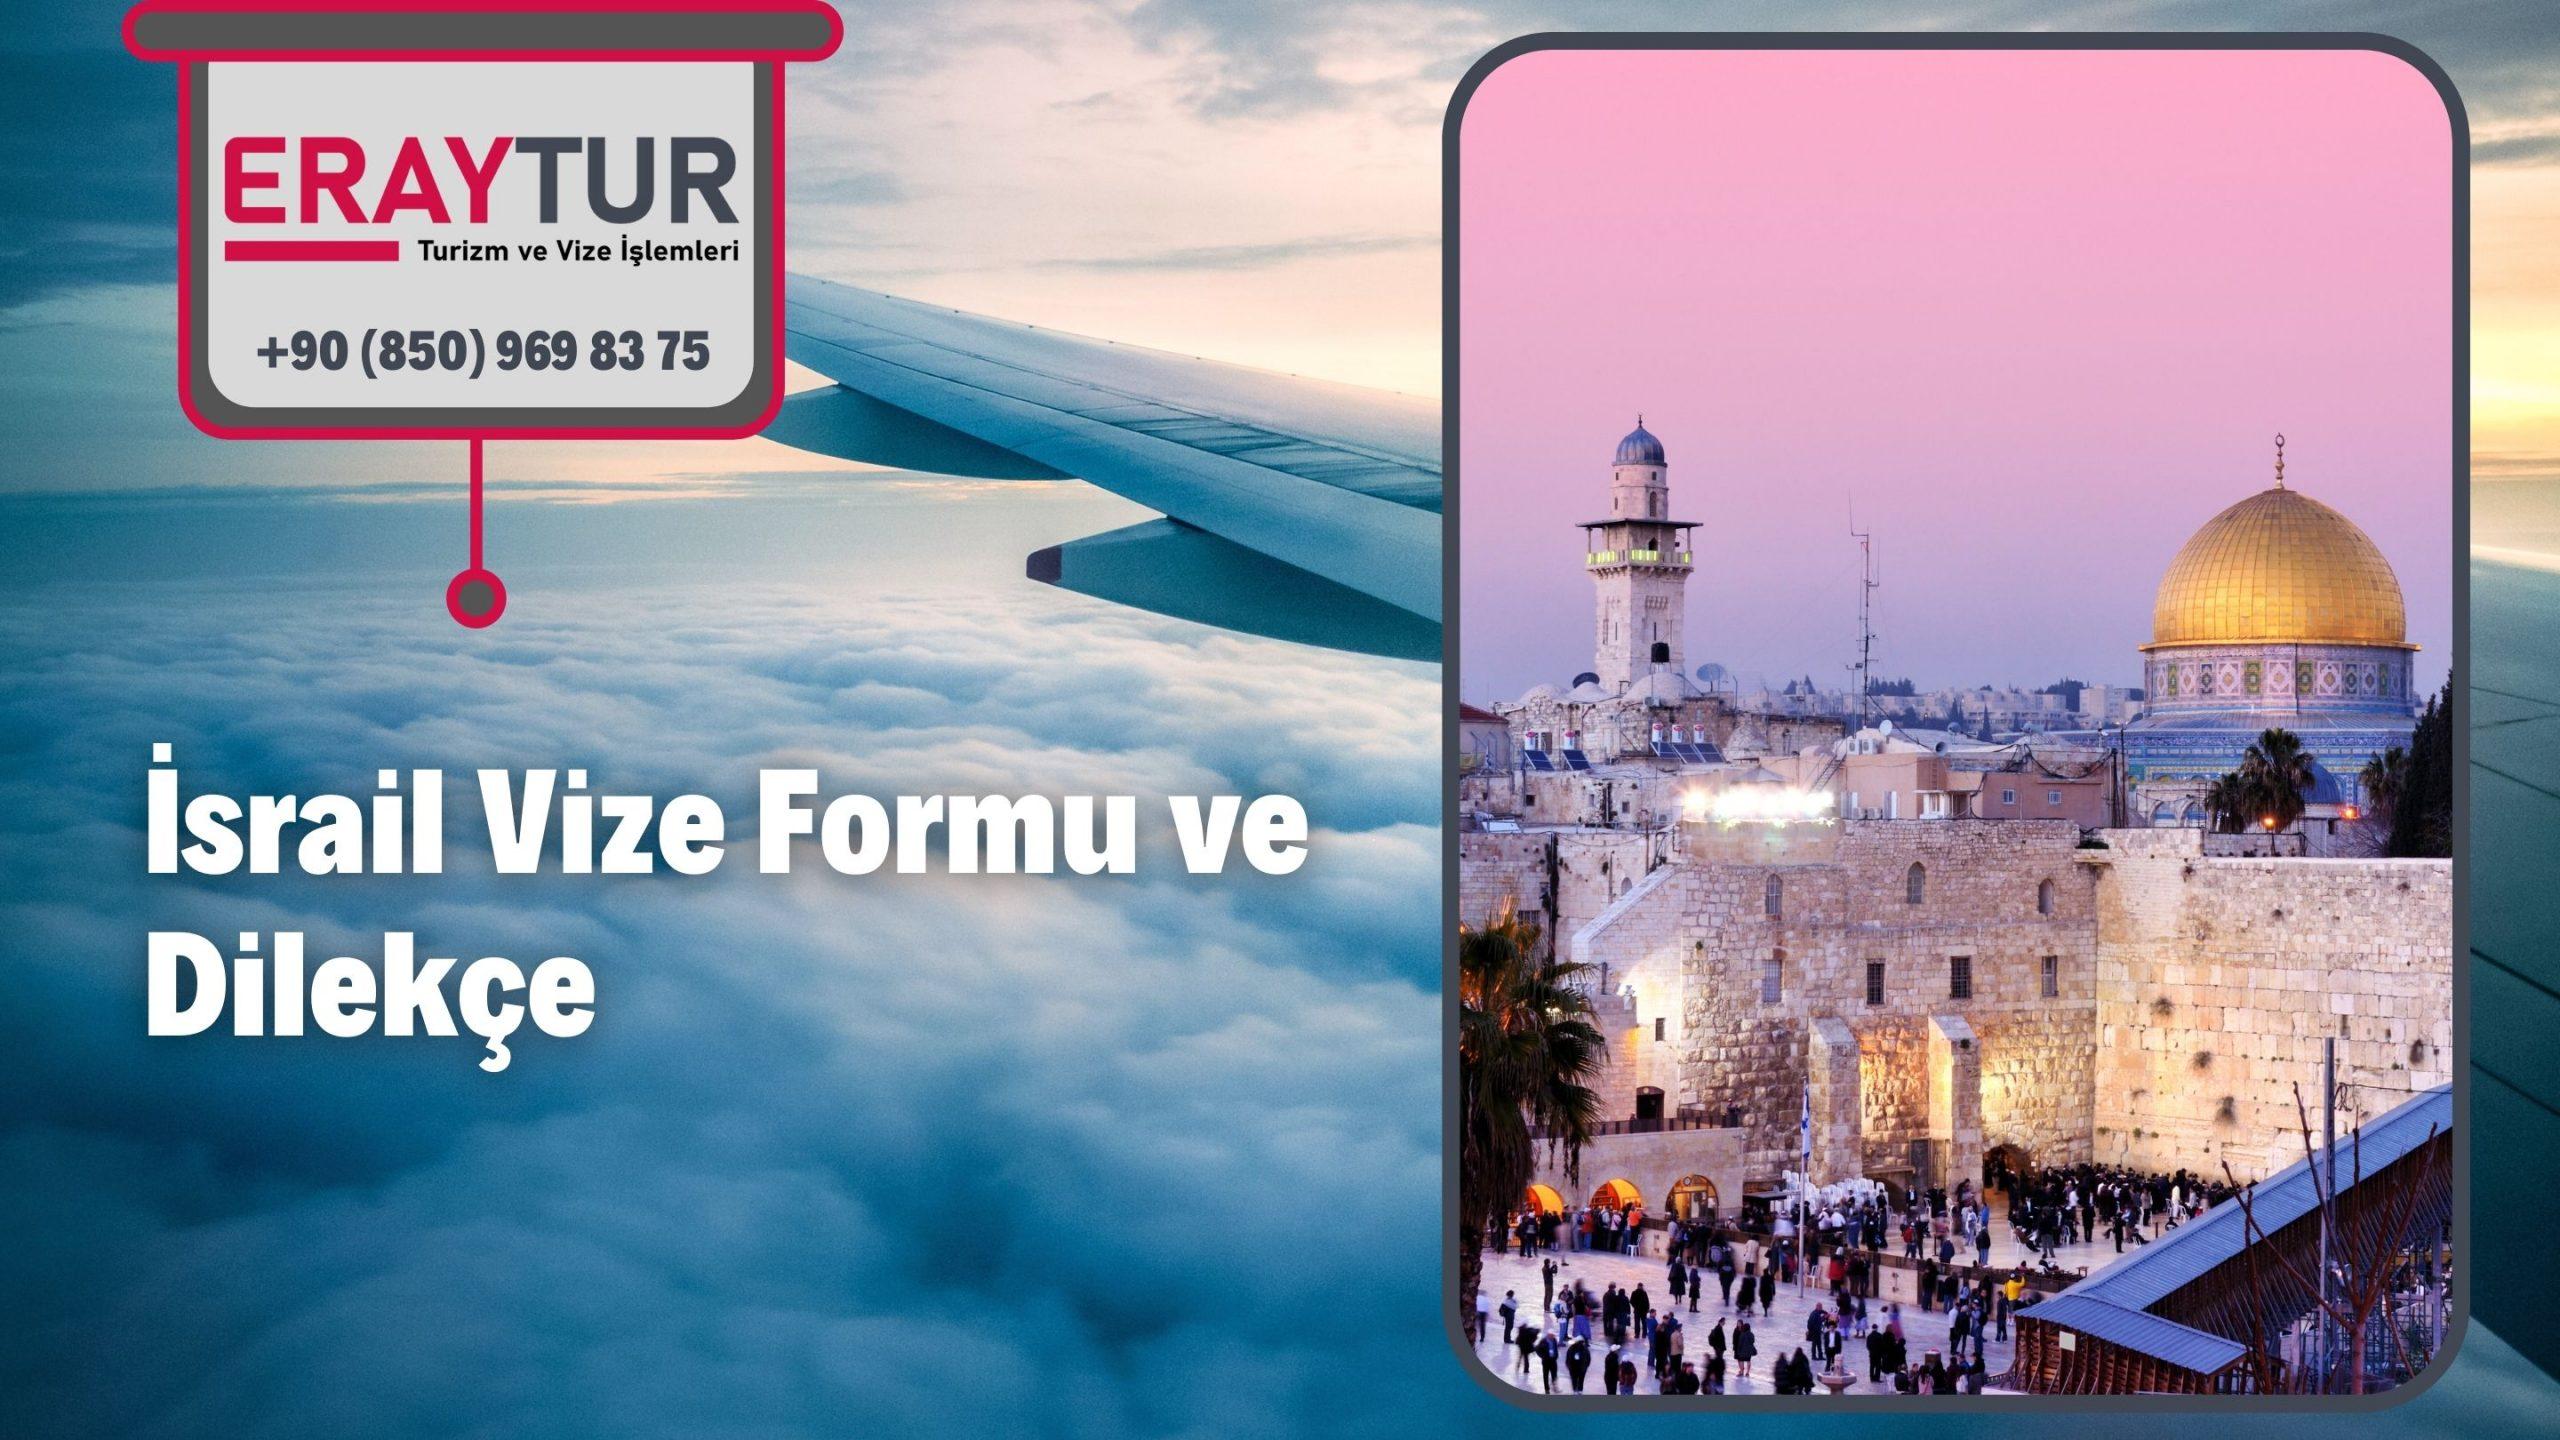 İsrail Vize Formu ve Dilekçe